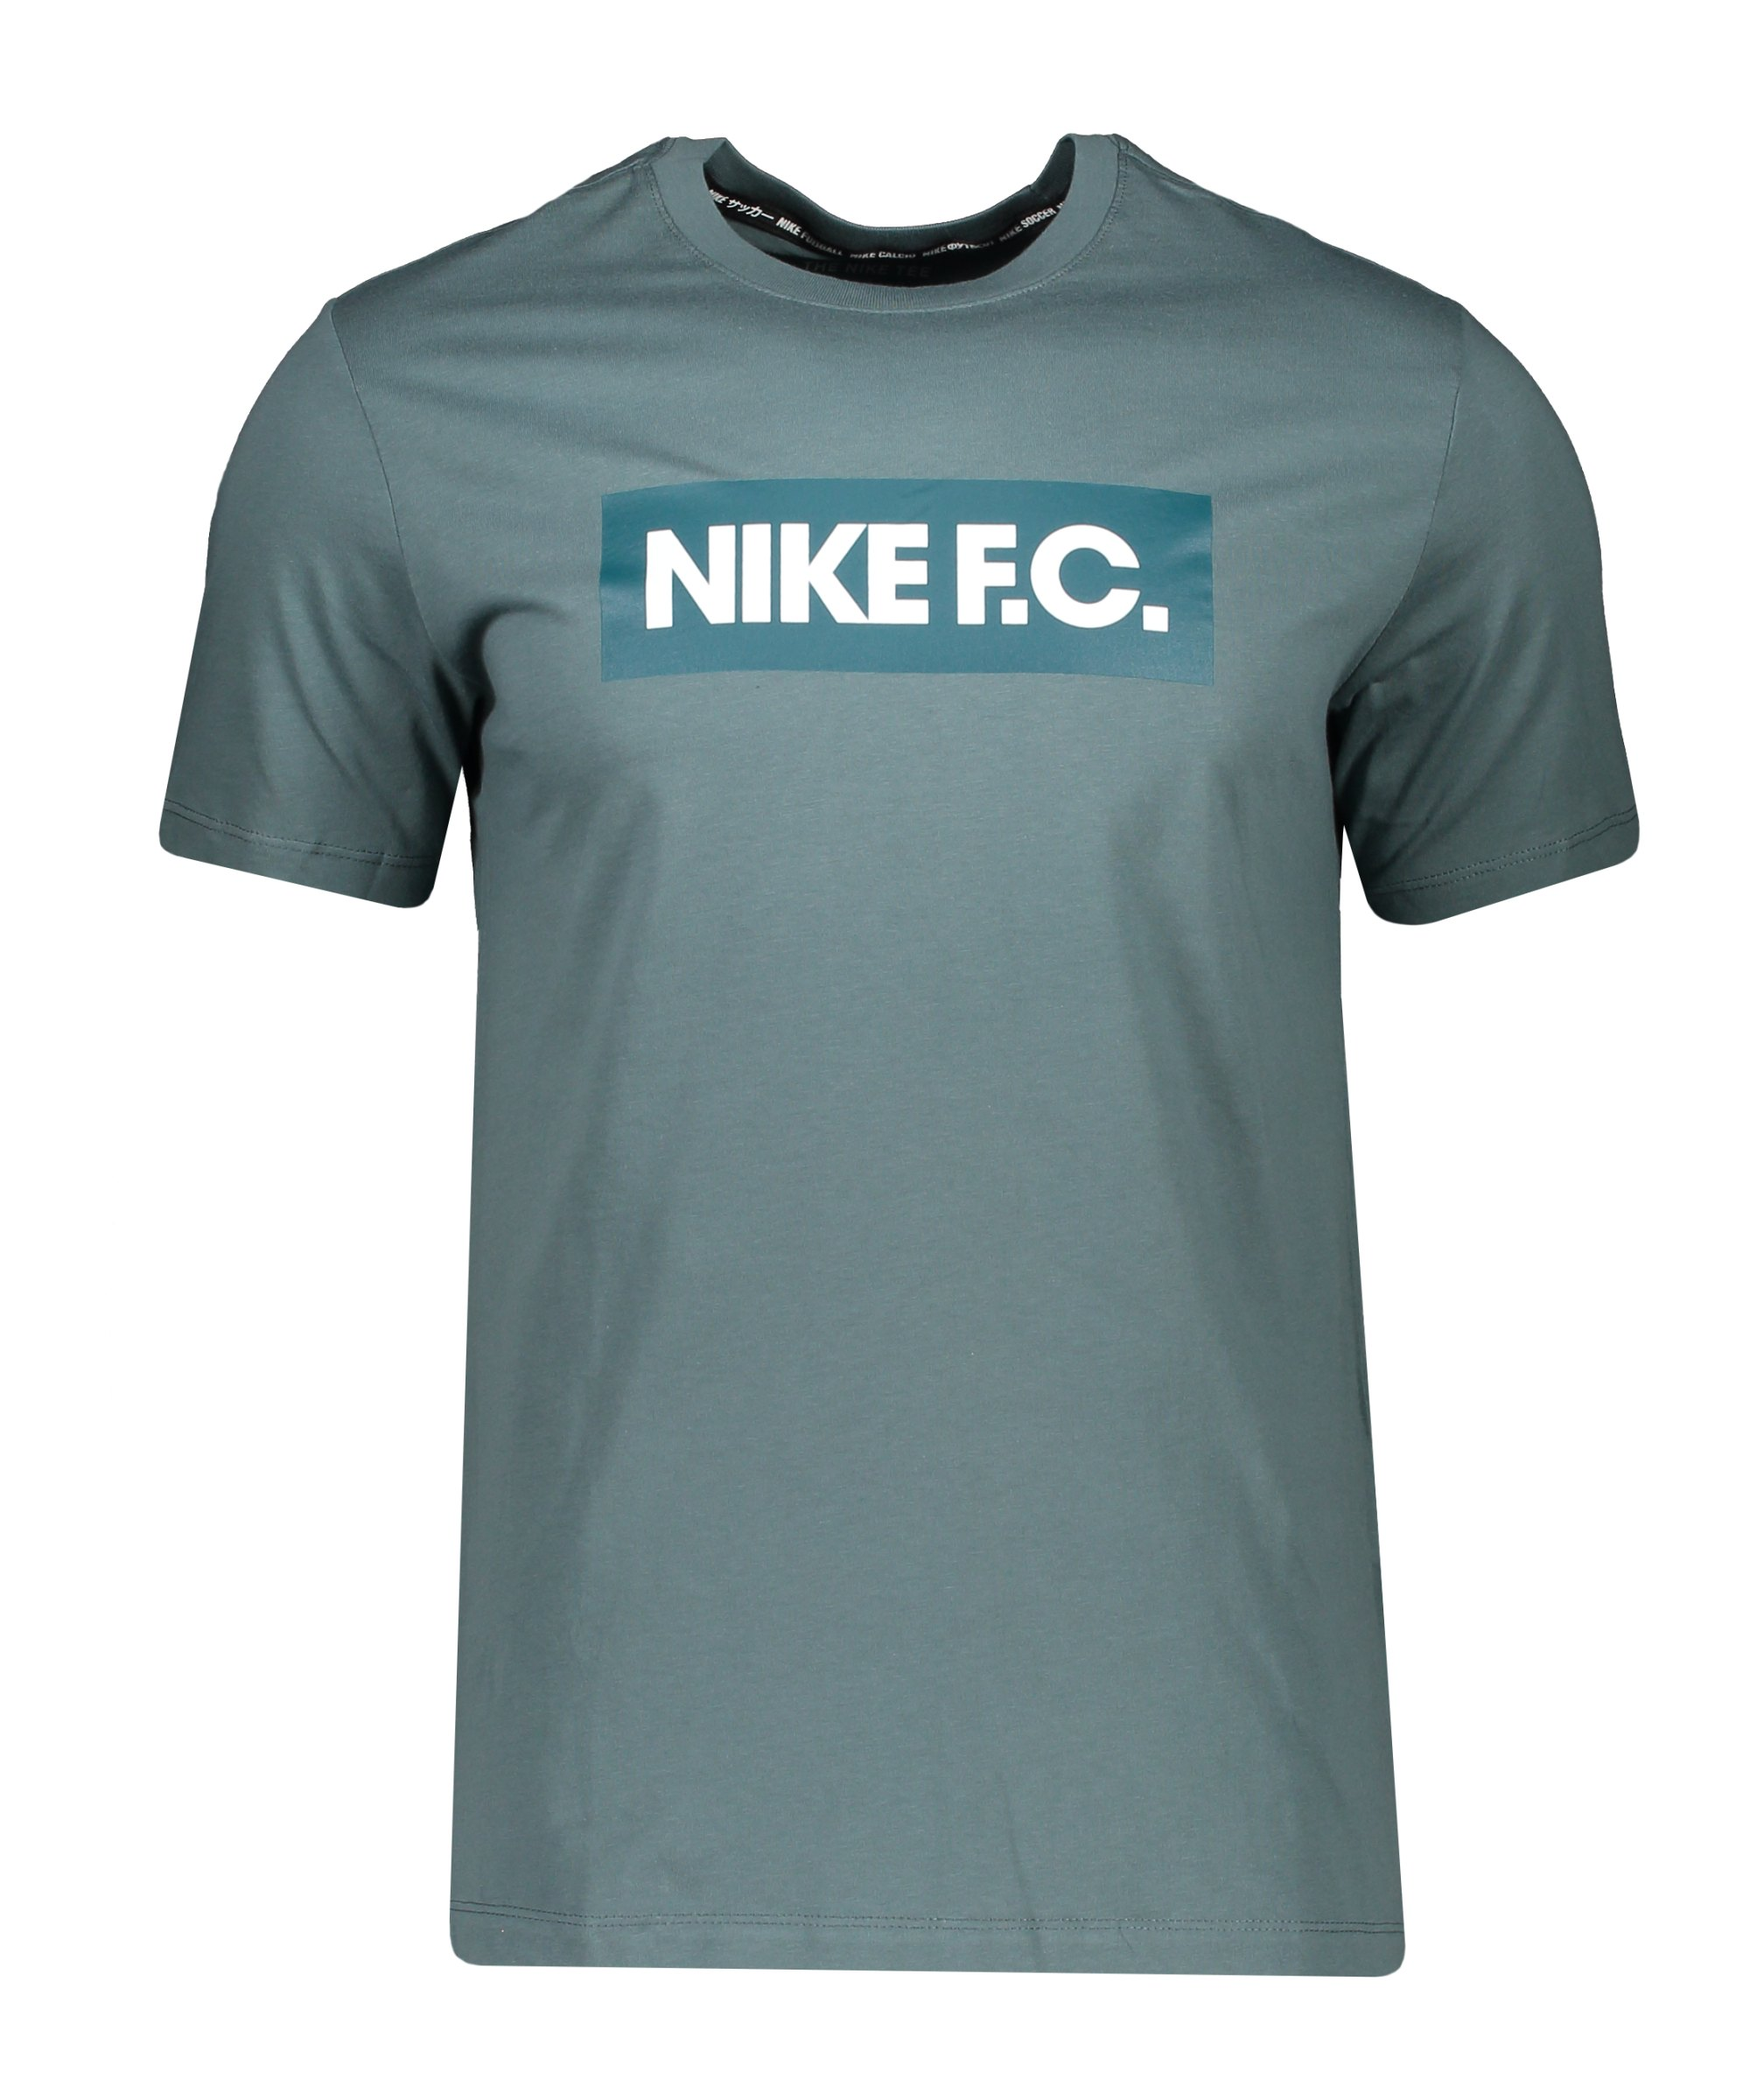 Nike F.C. Essential T-Shirt Grün F387 - gruen